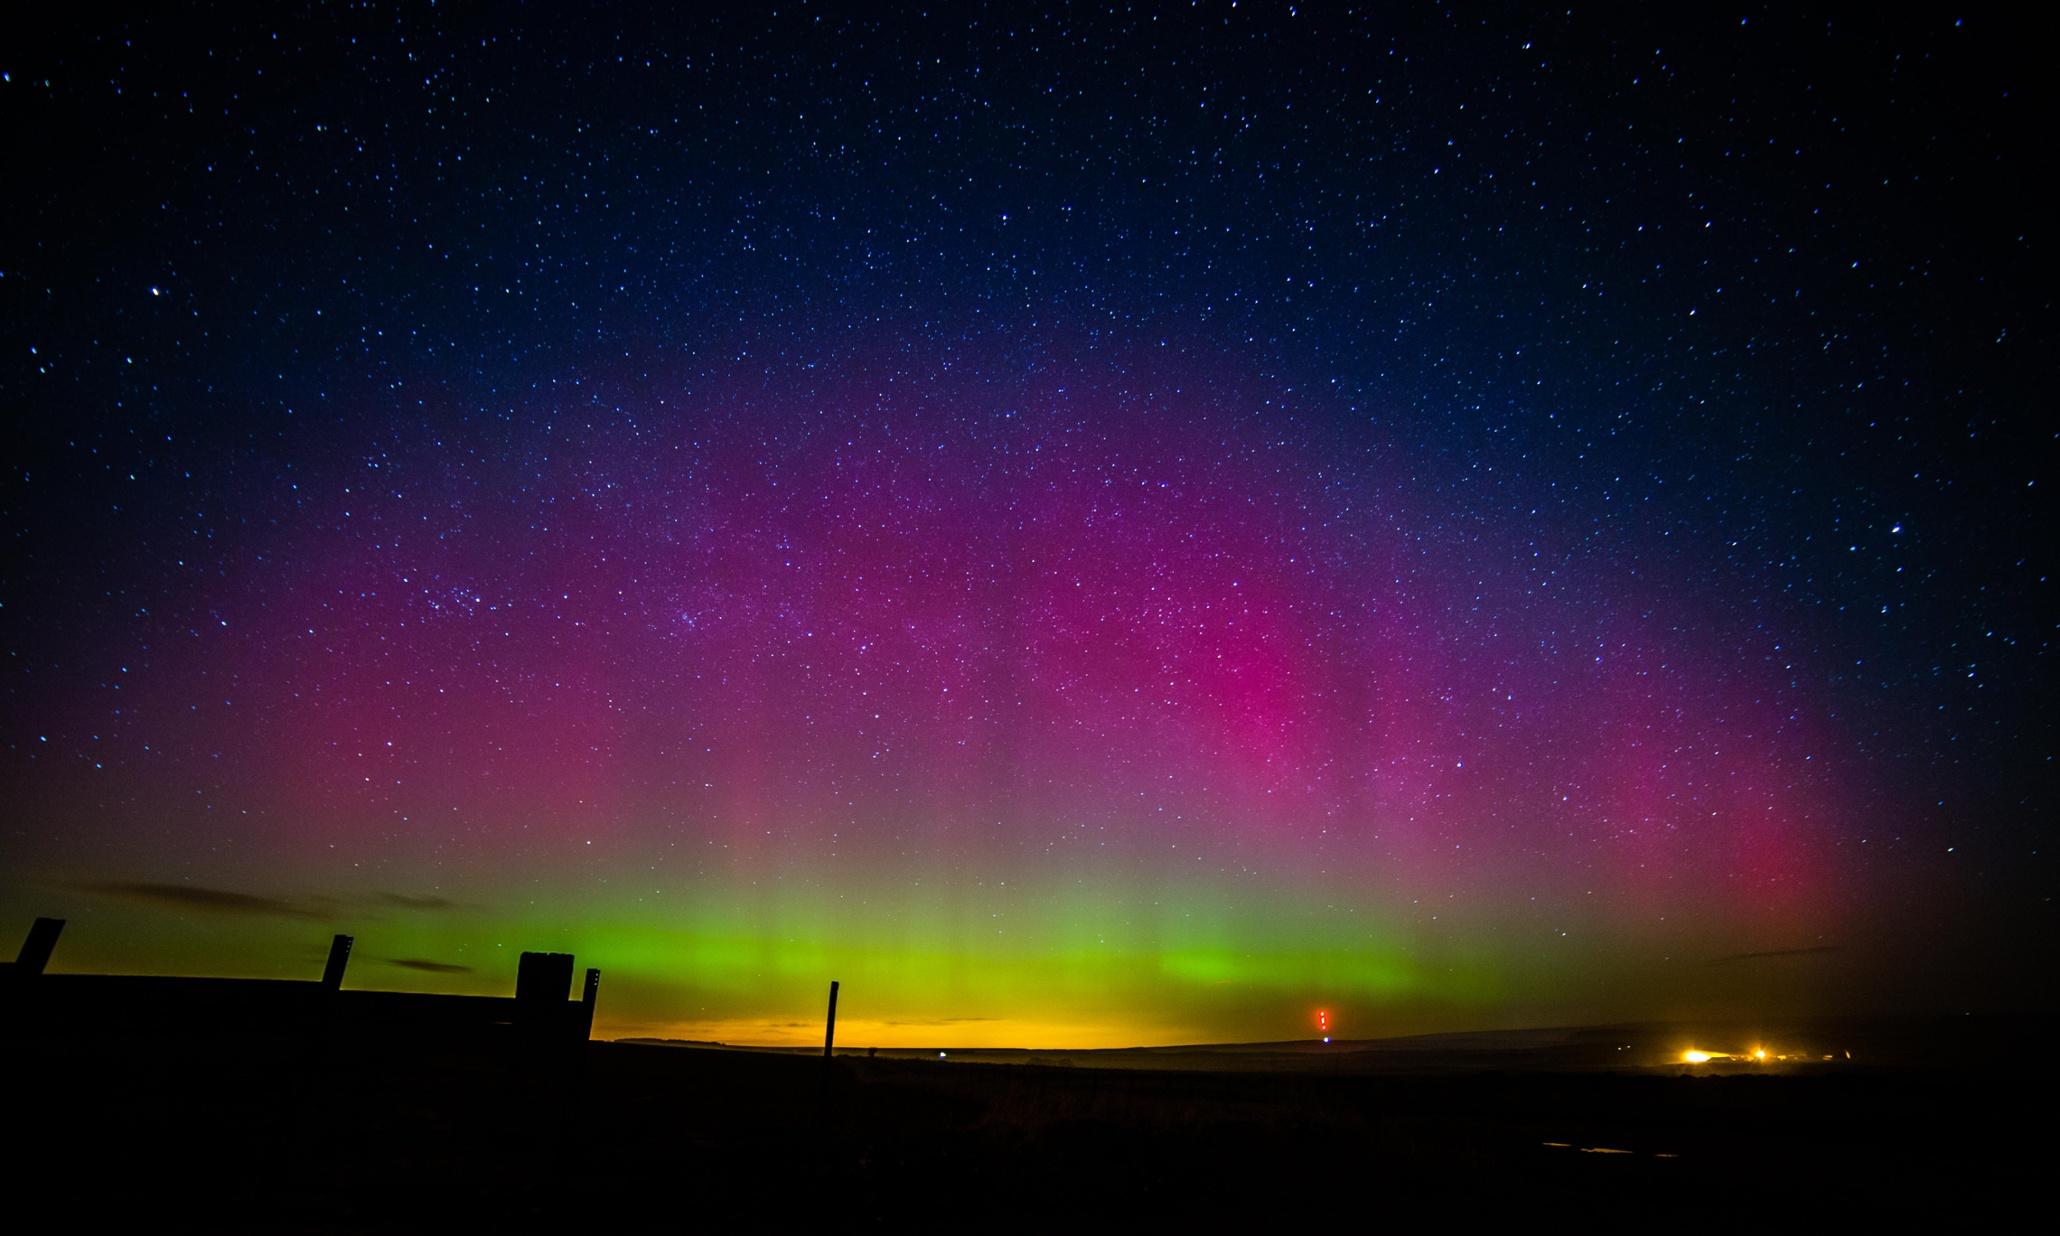 solar storm yorkshire - photo #7